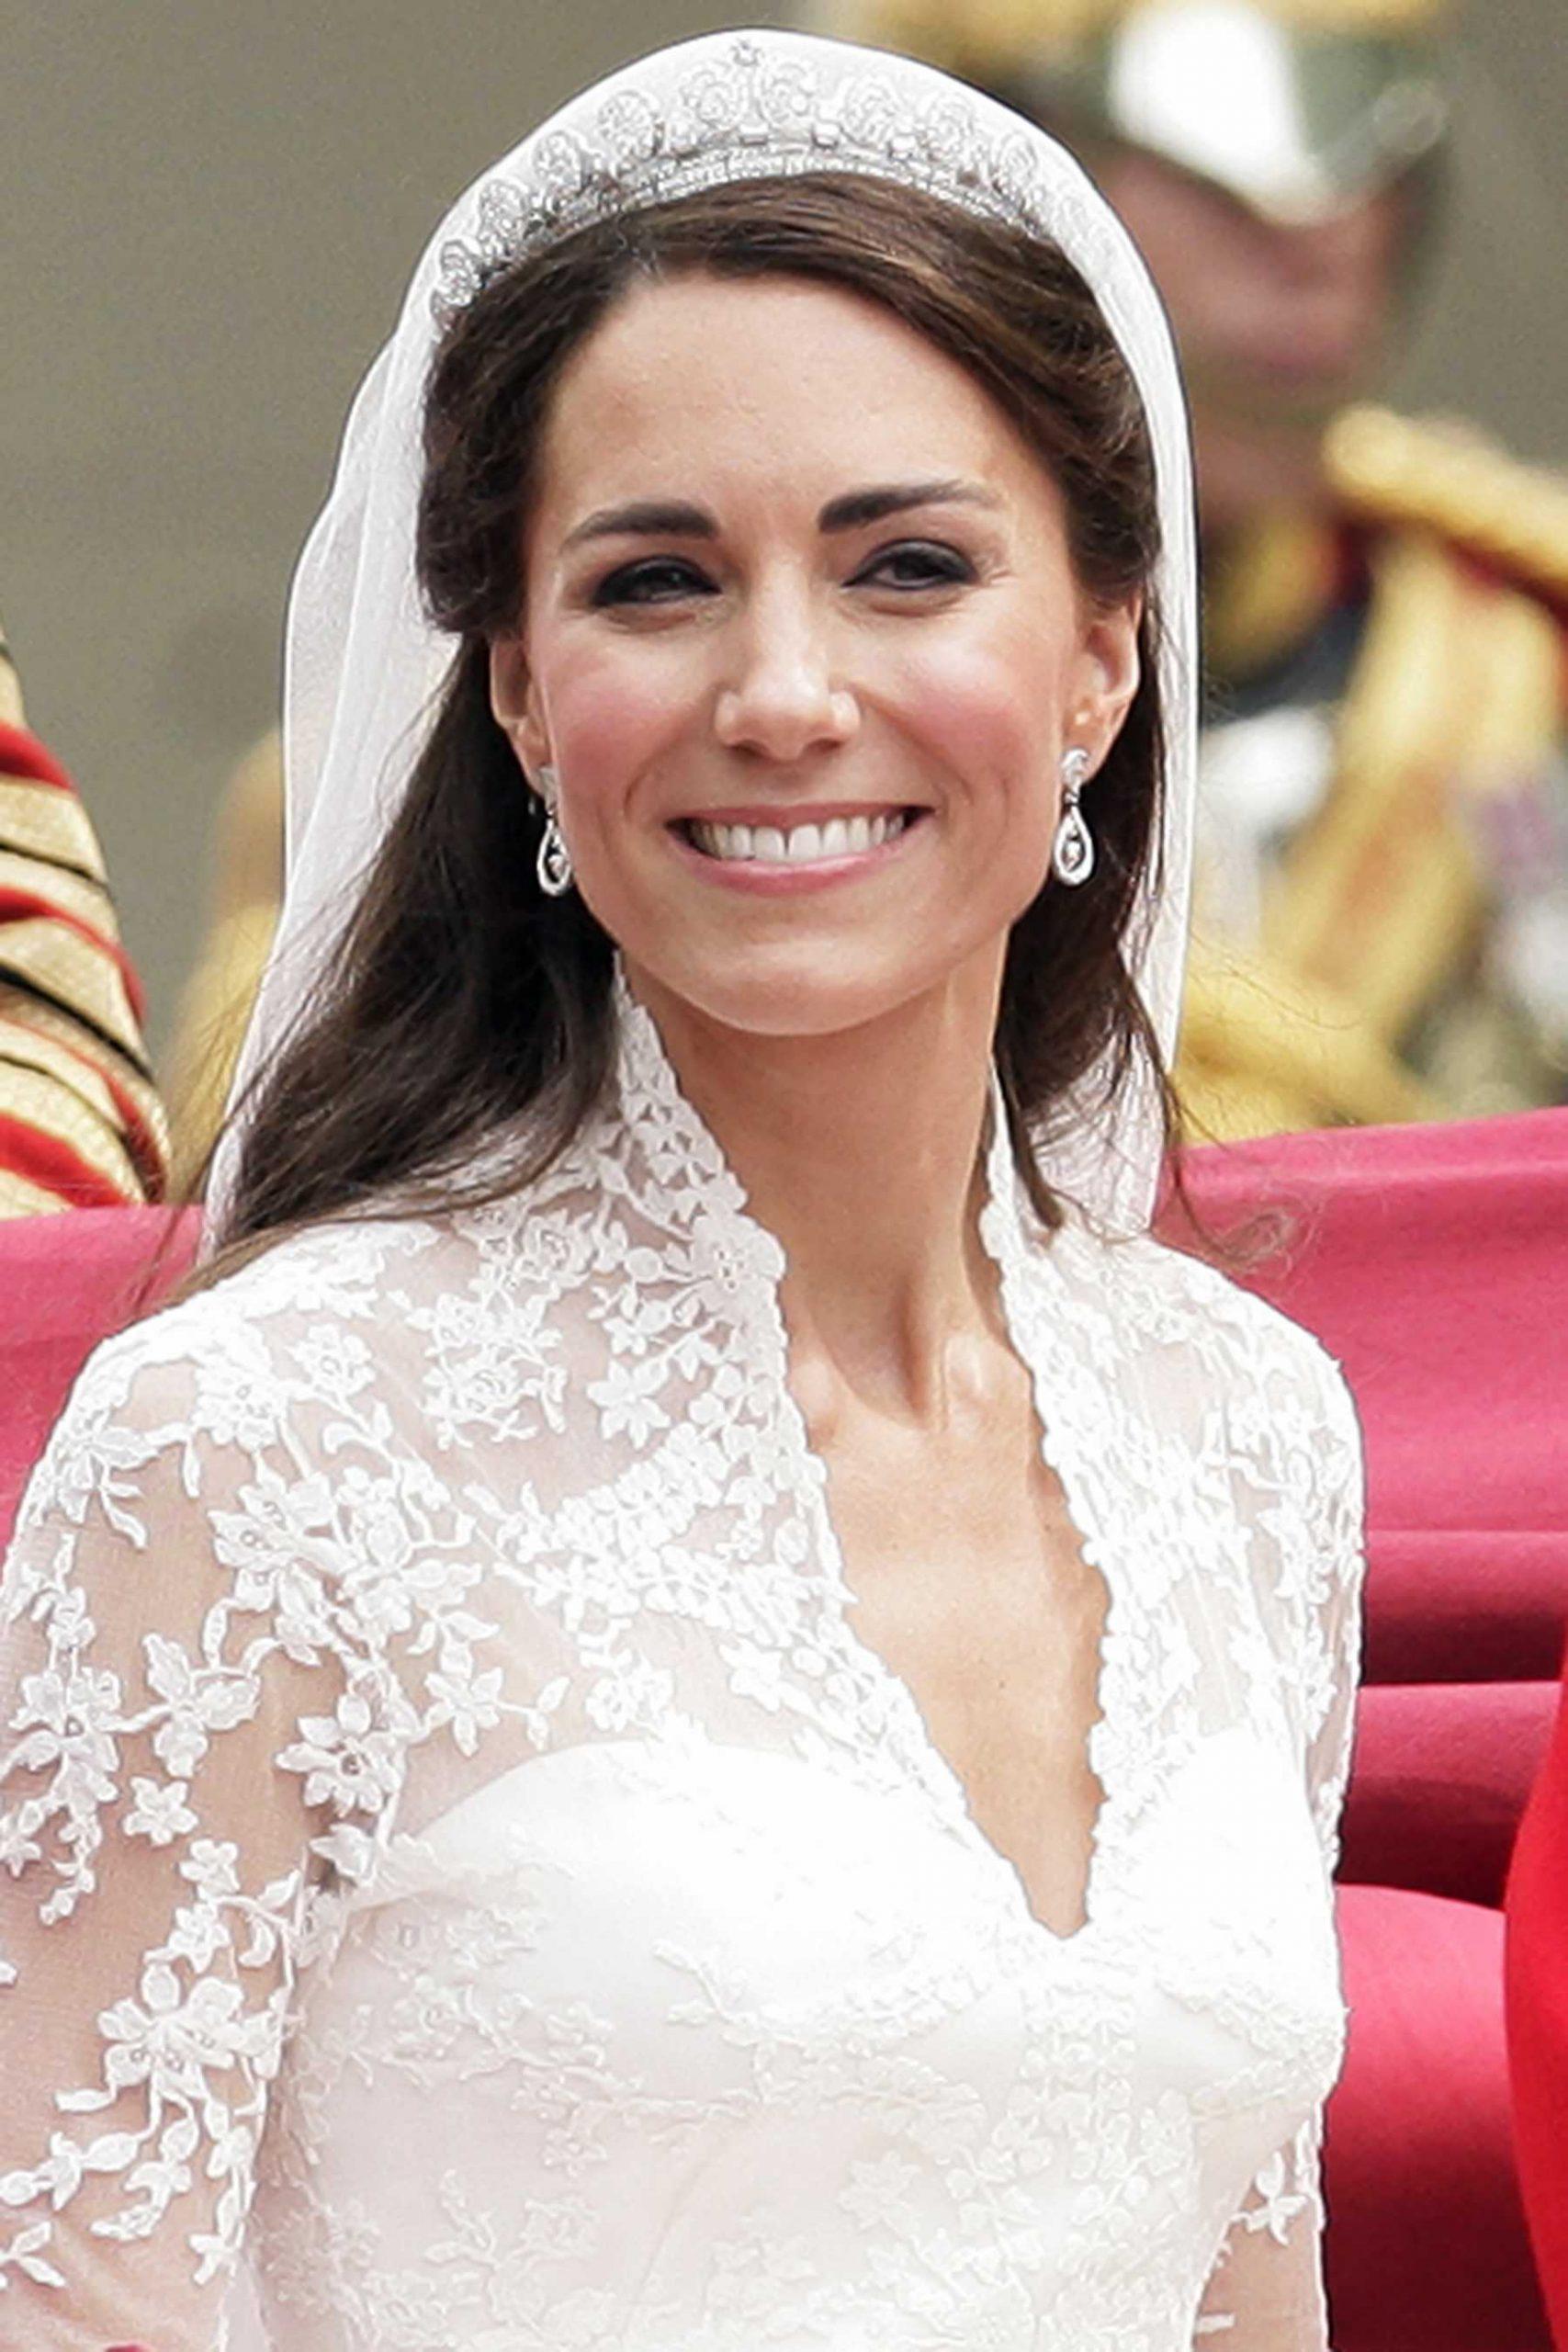 Kate Middleton awesome